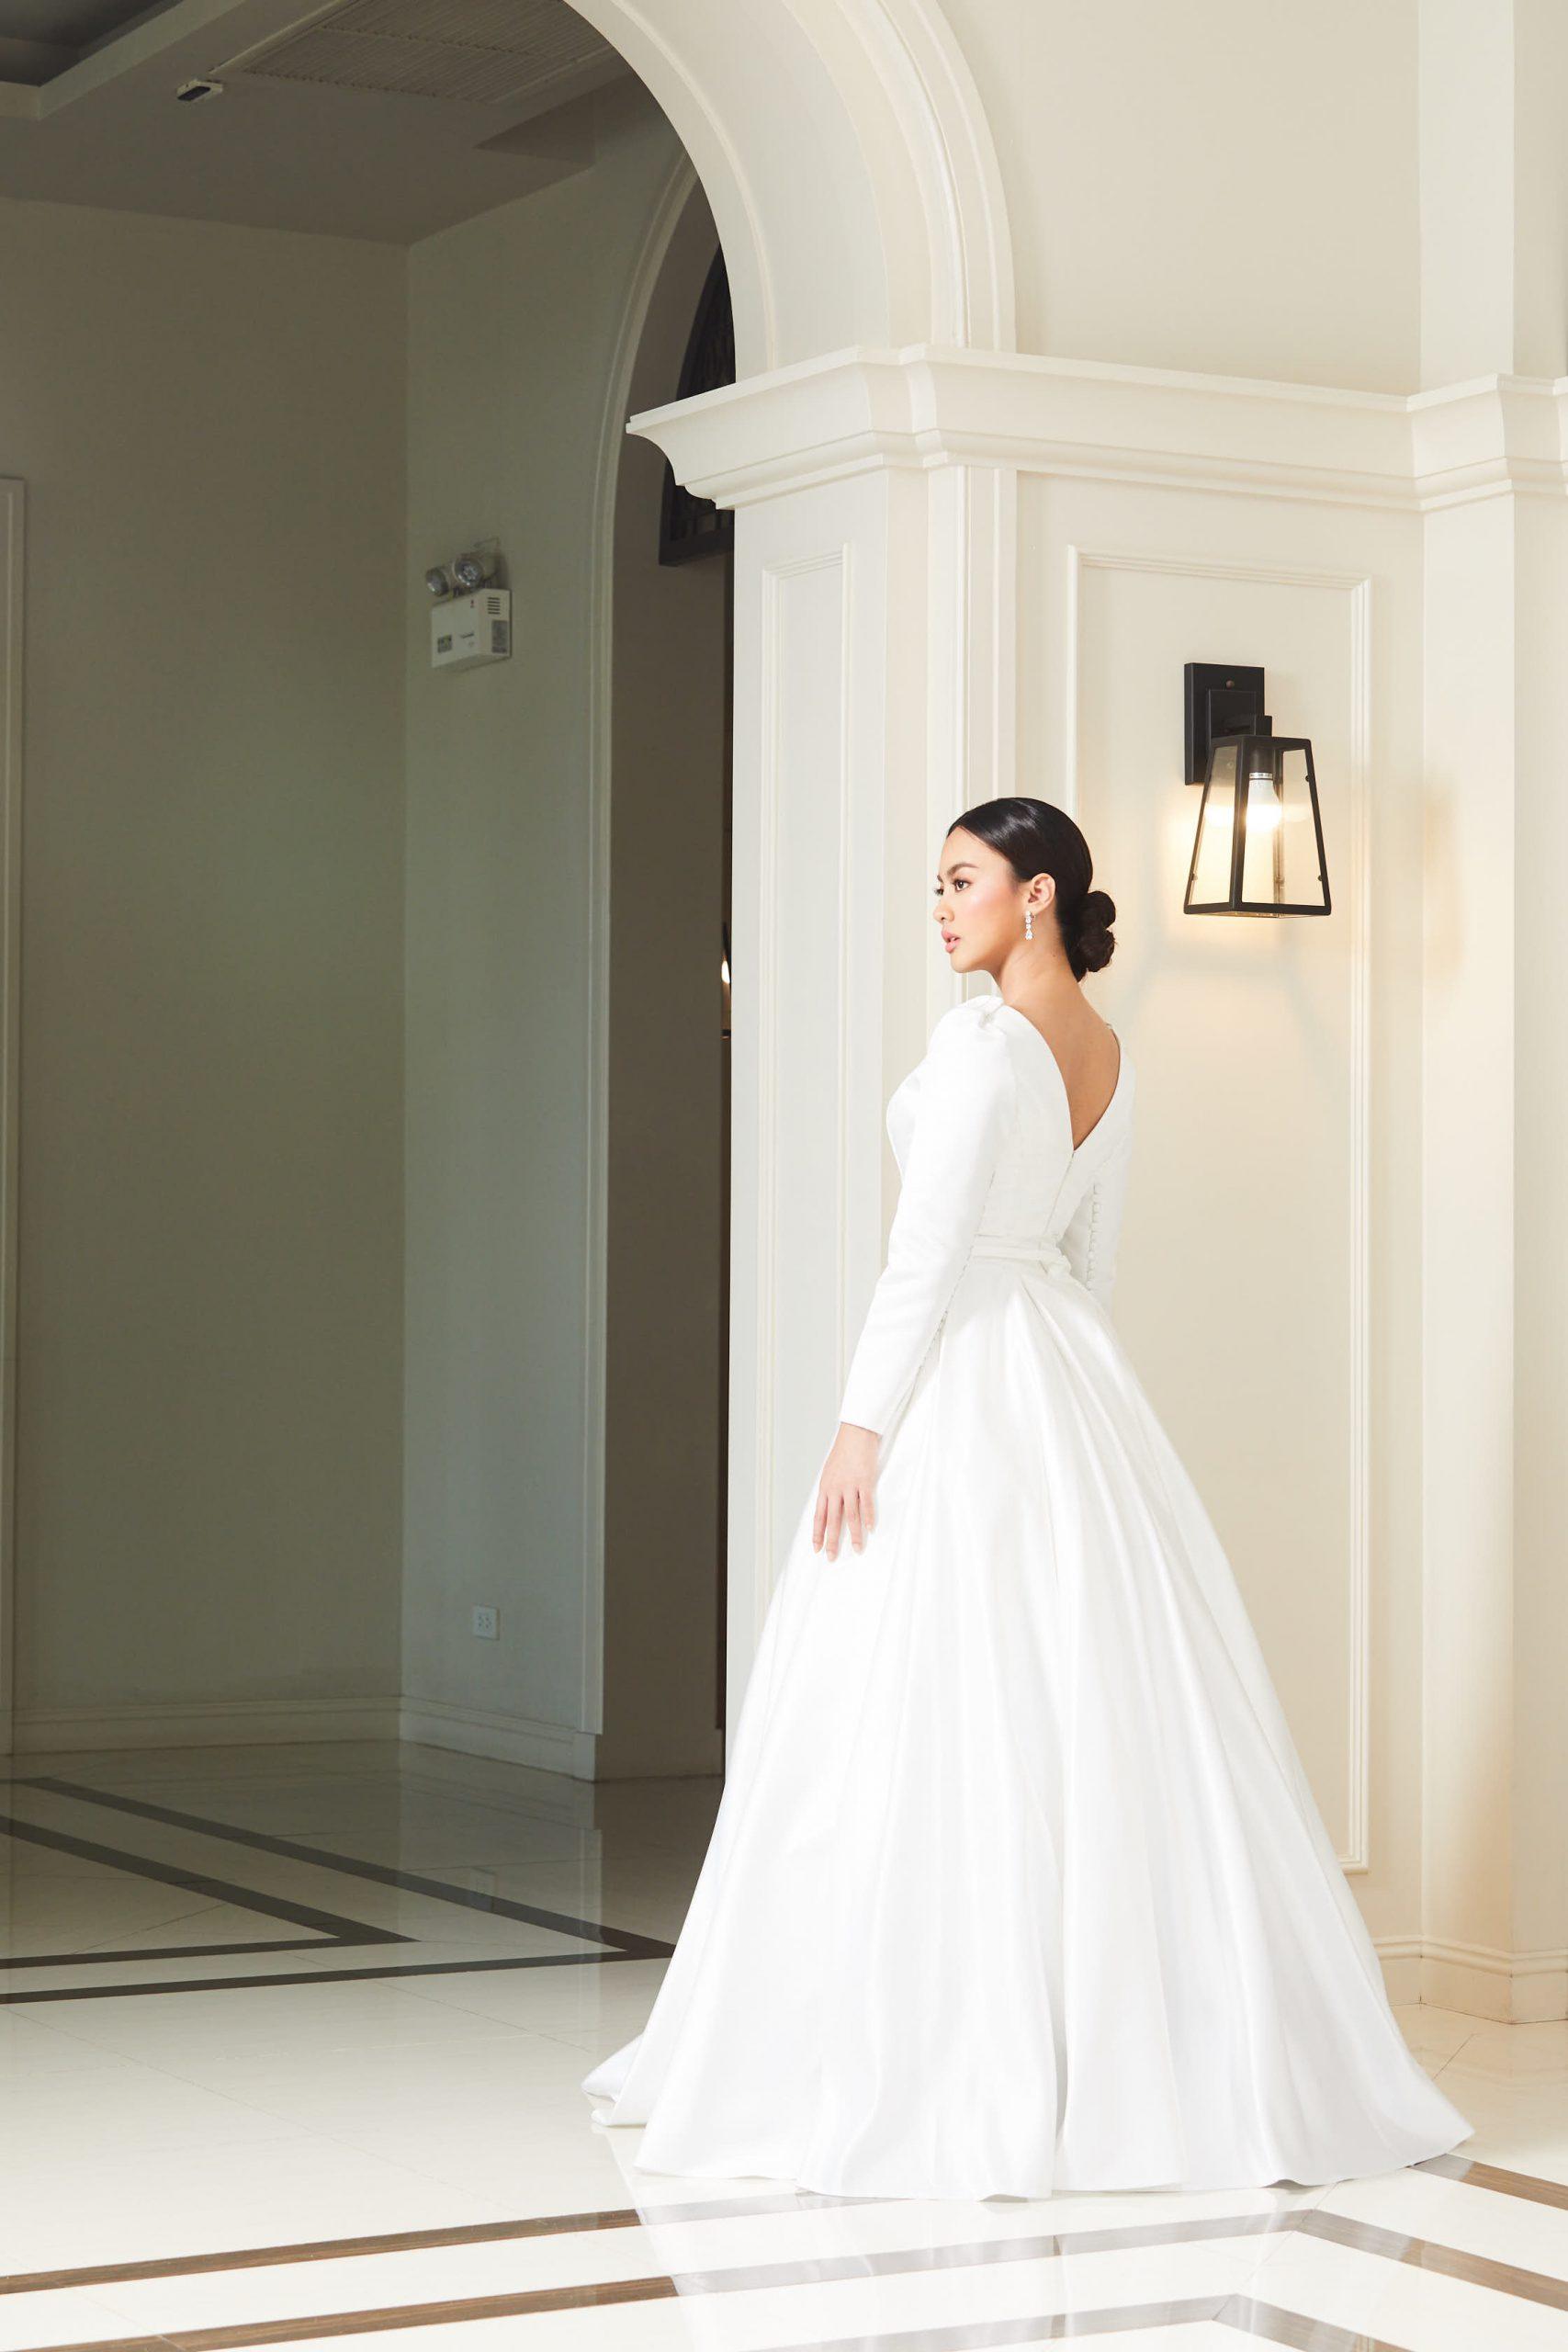 Praew Wedding 21-10-1911220